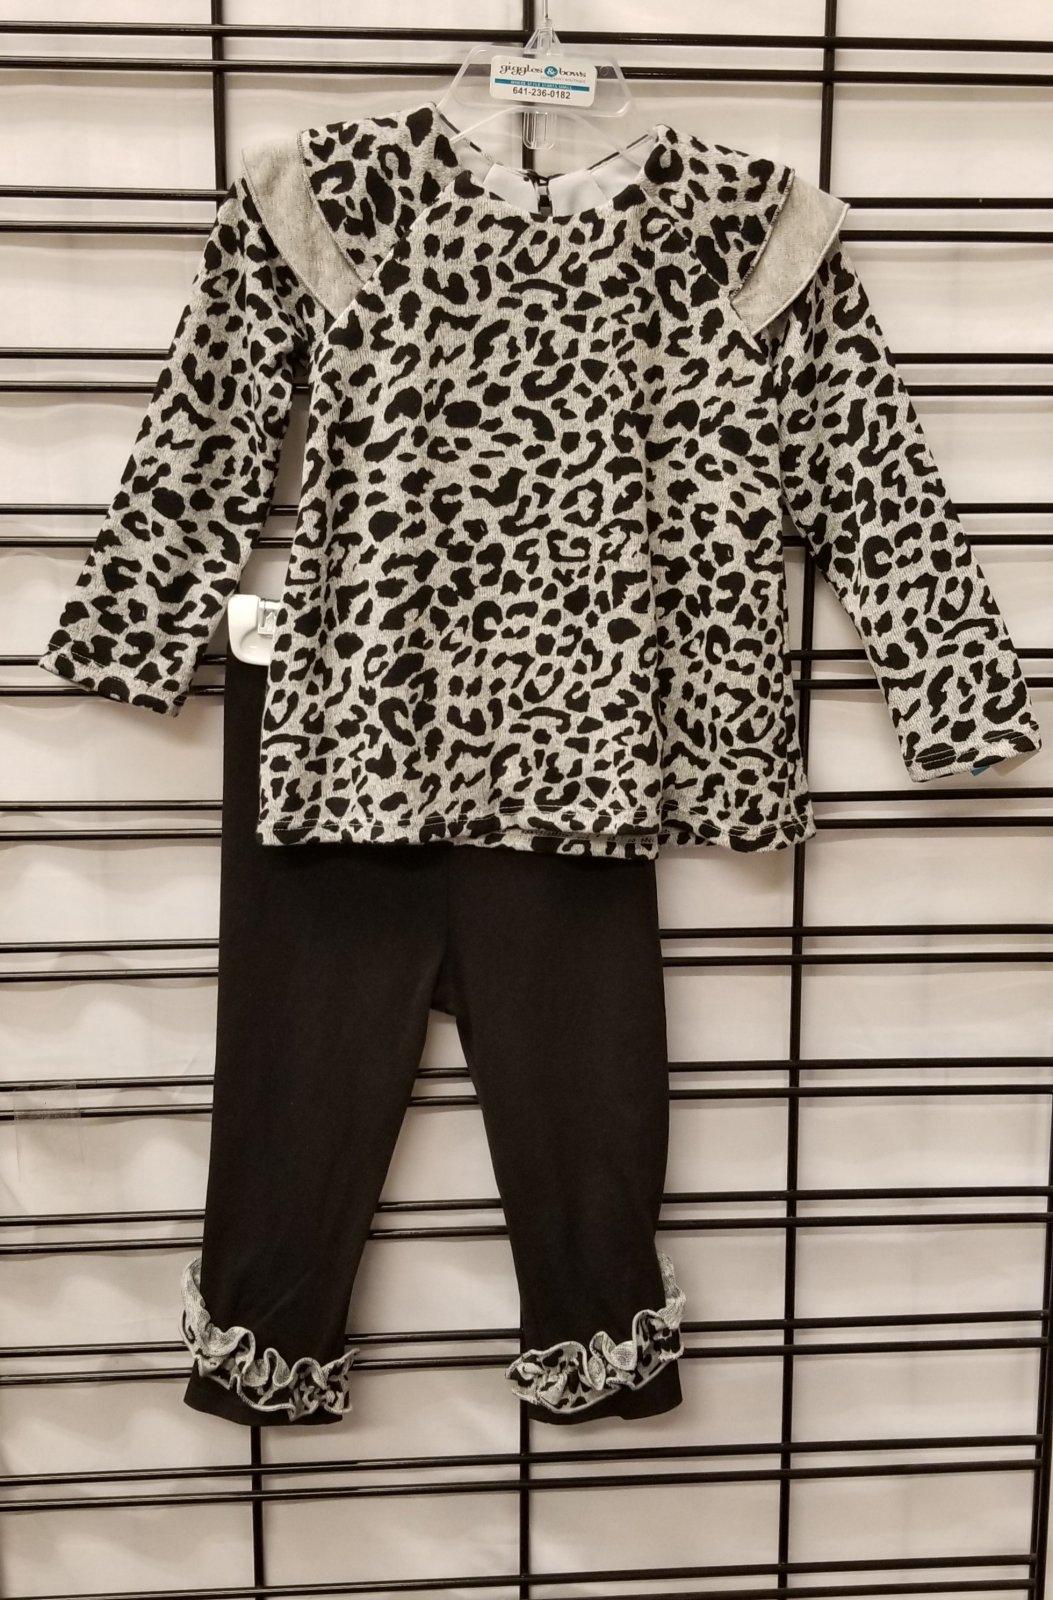 ISOBELLA & CHLOE - Leopard tunic/legging